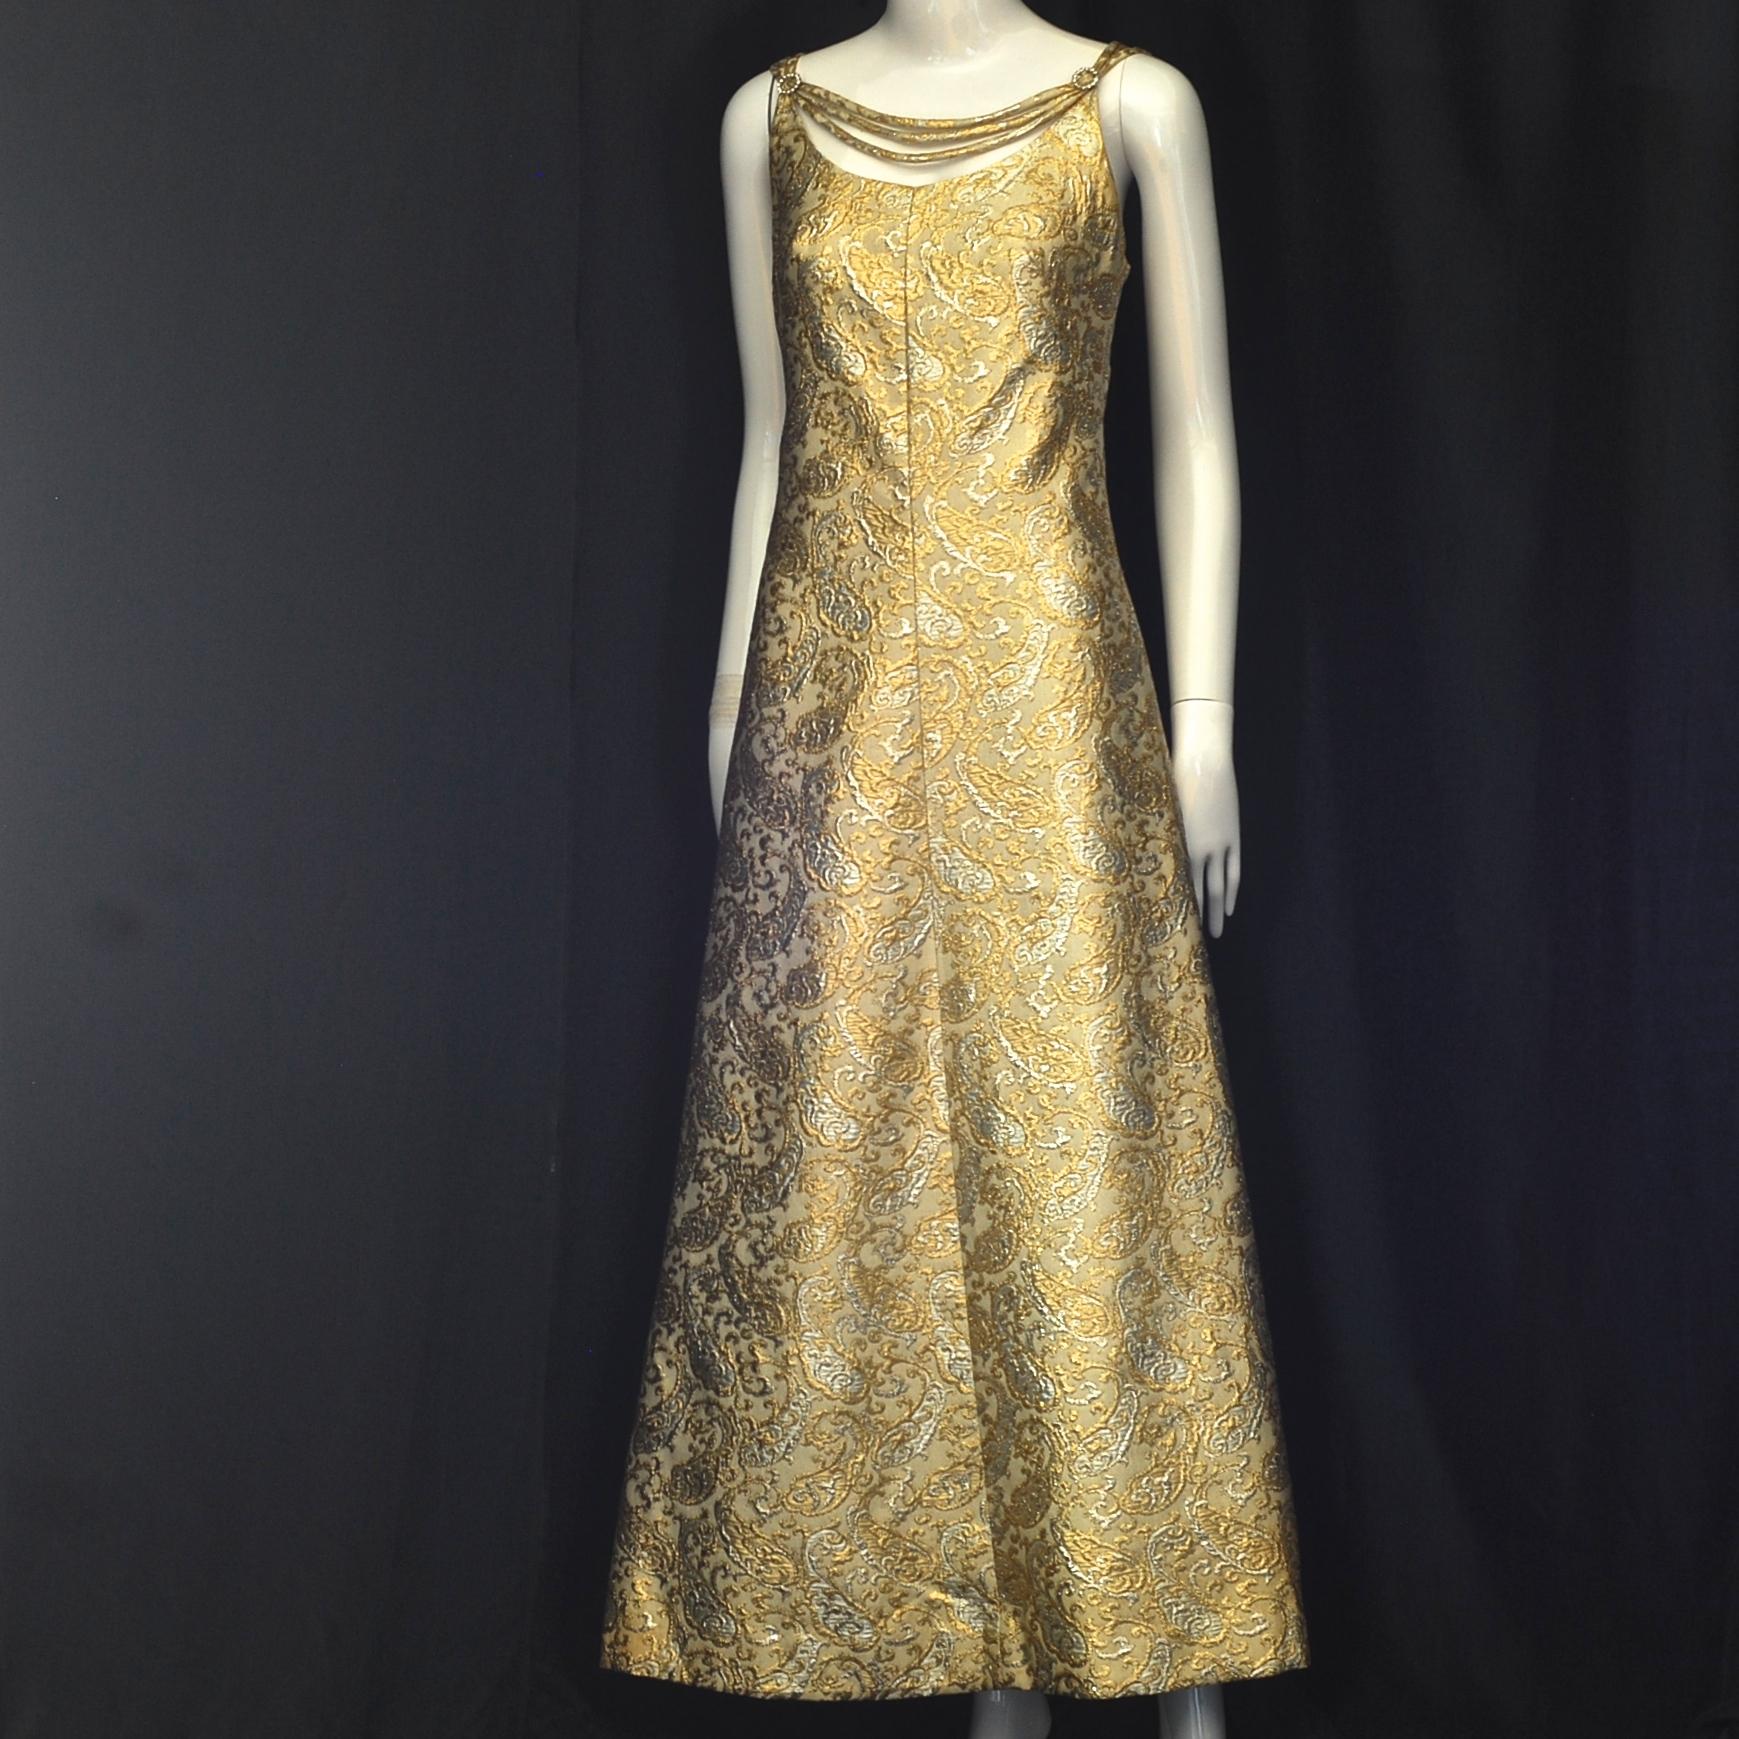 gold brocade dress off 67% - gidagkp.org